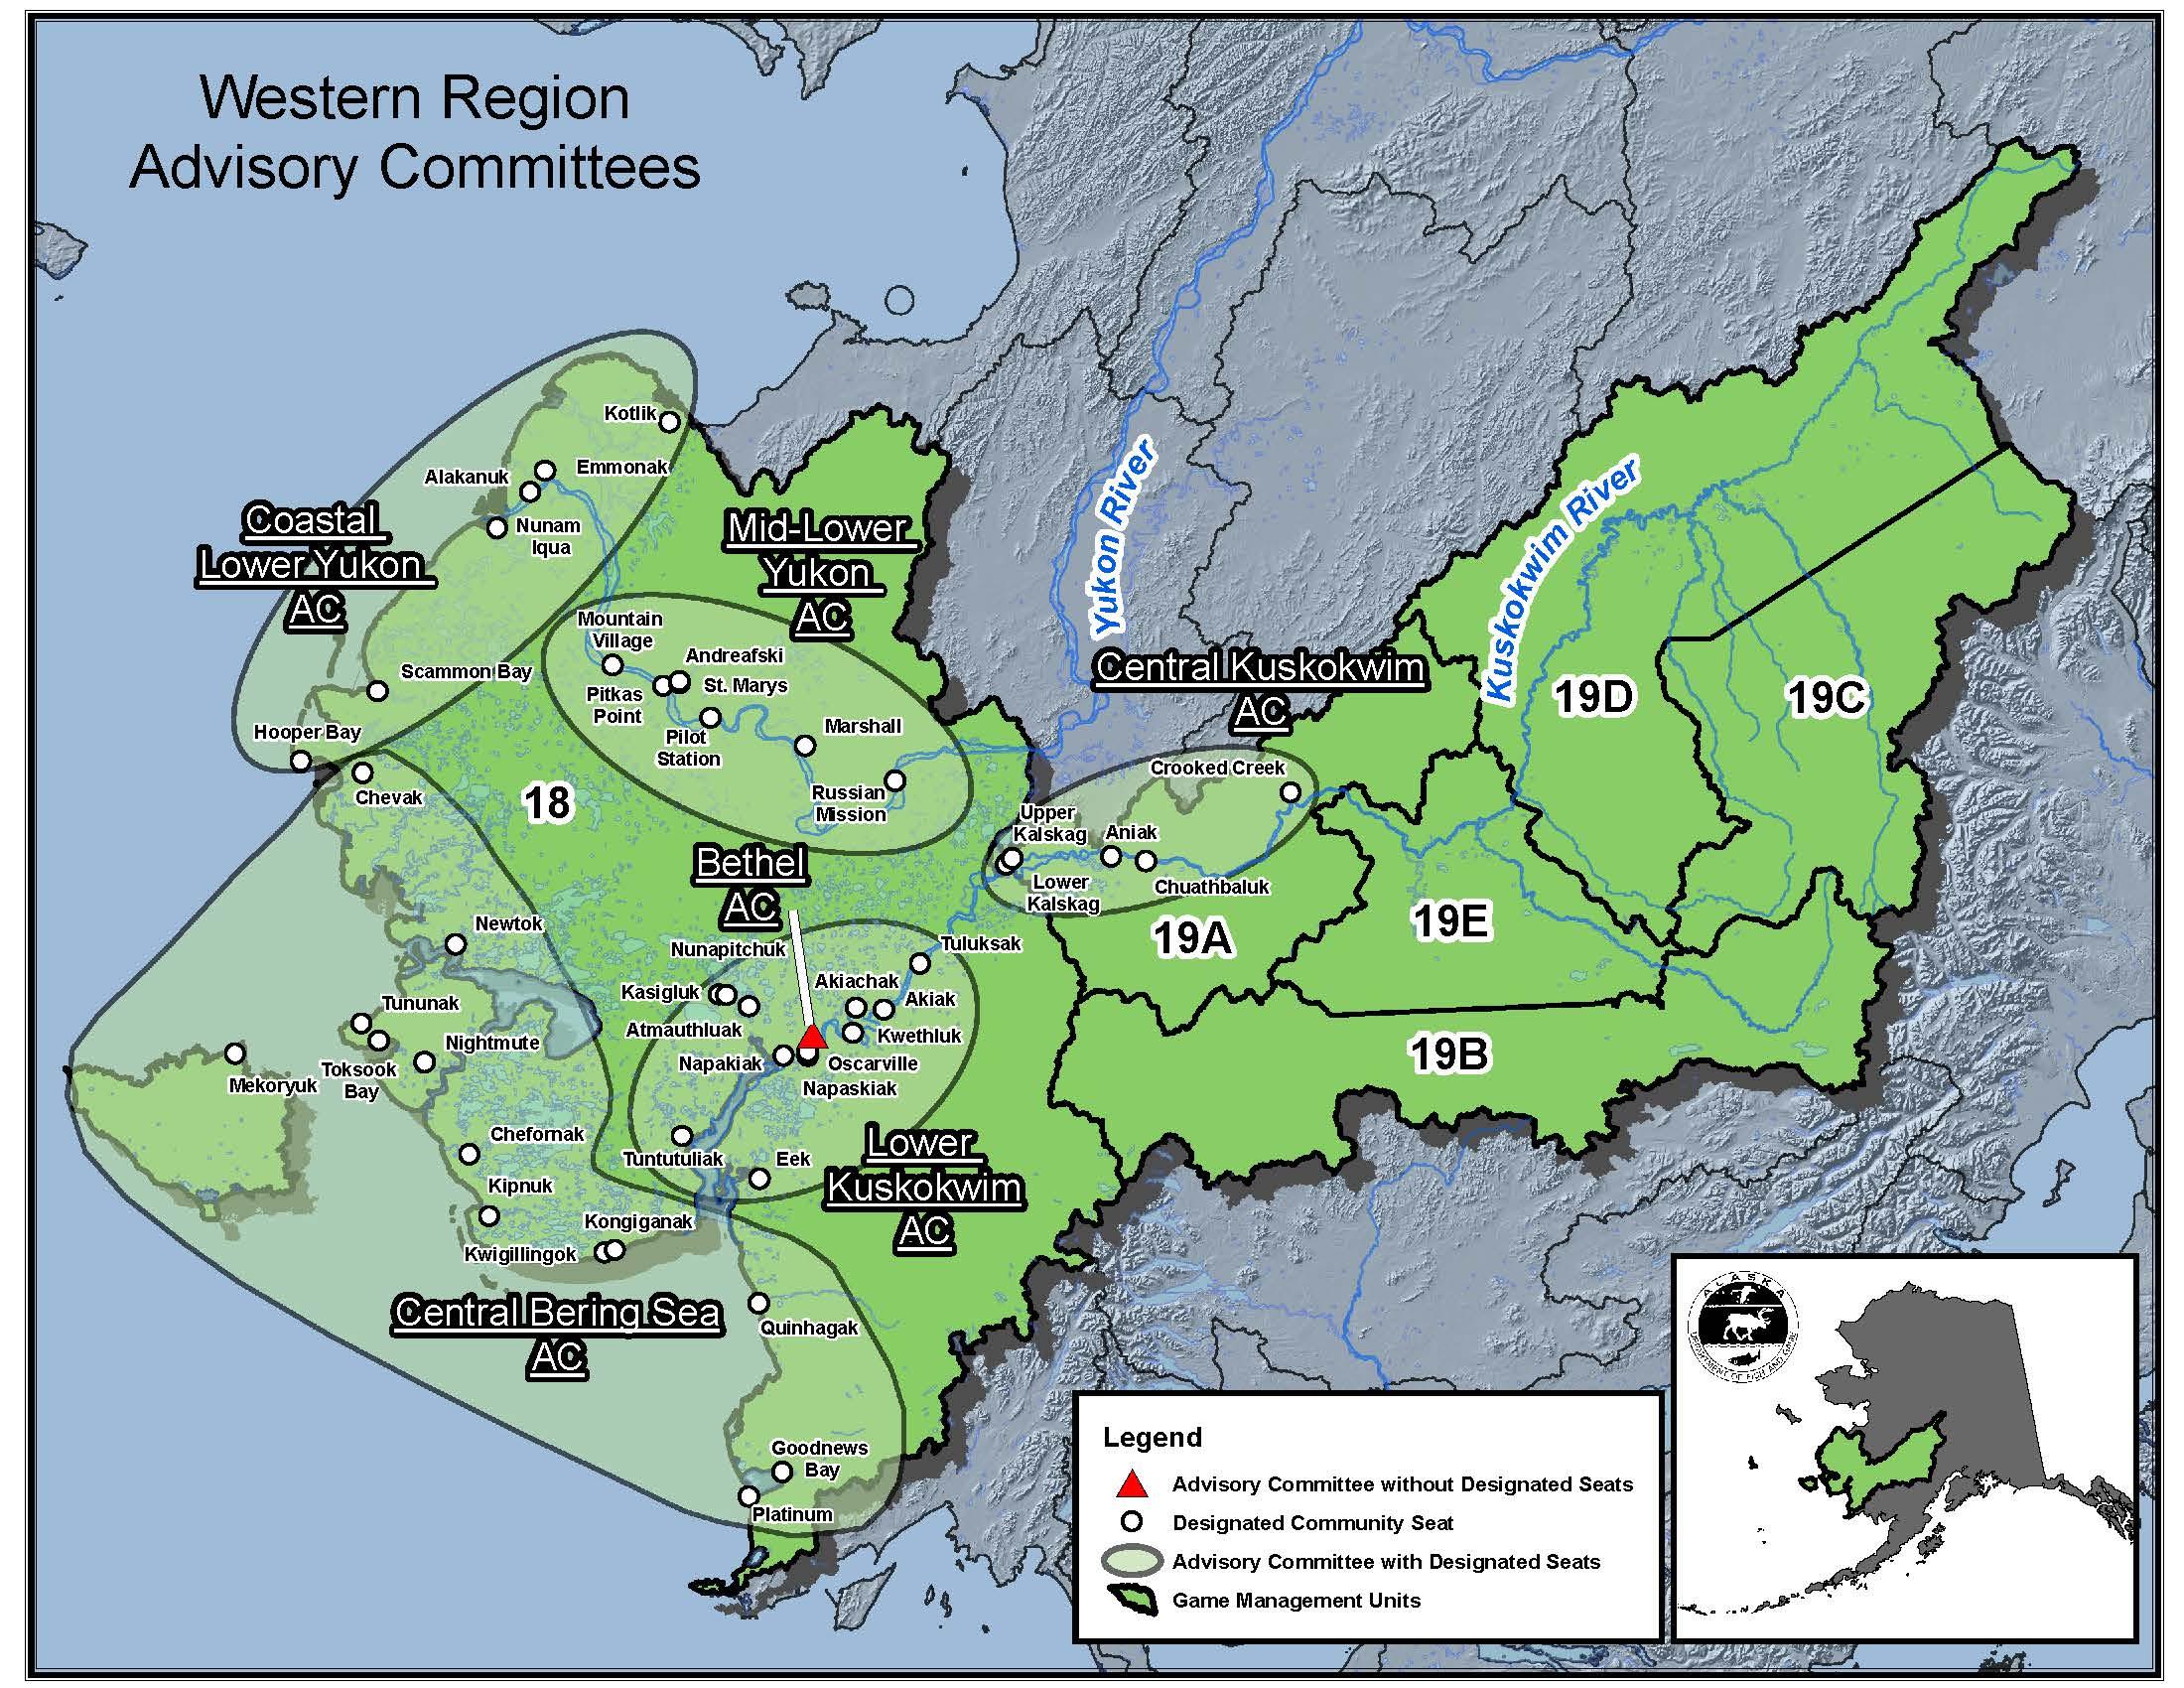 View Map of Western Region Advisory